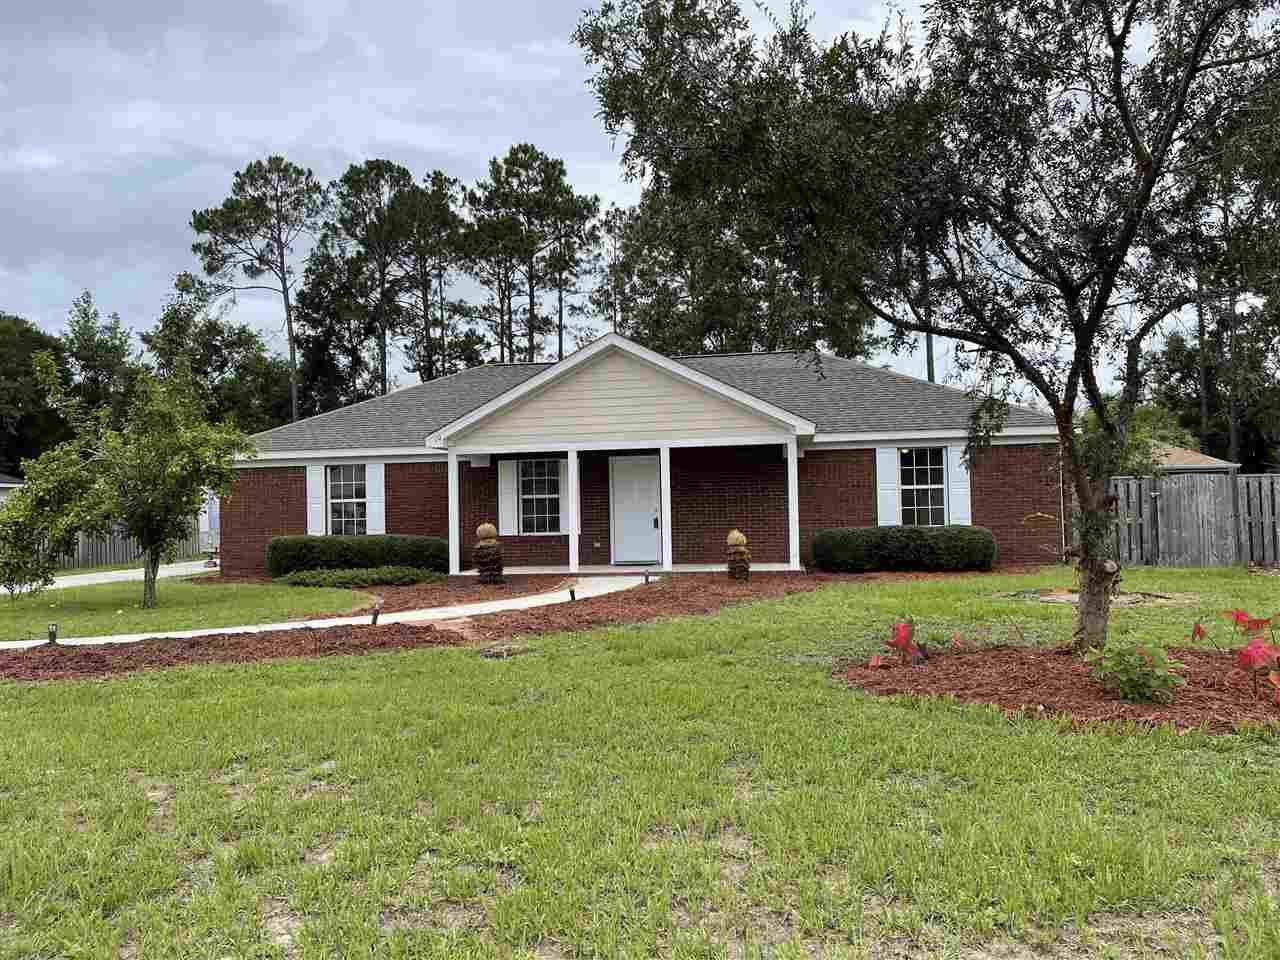 10 Country Way, Crawfordville, FL 32327 - MLS#: 335026